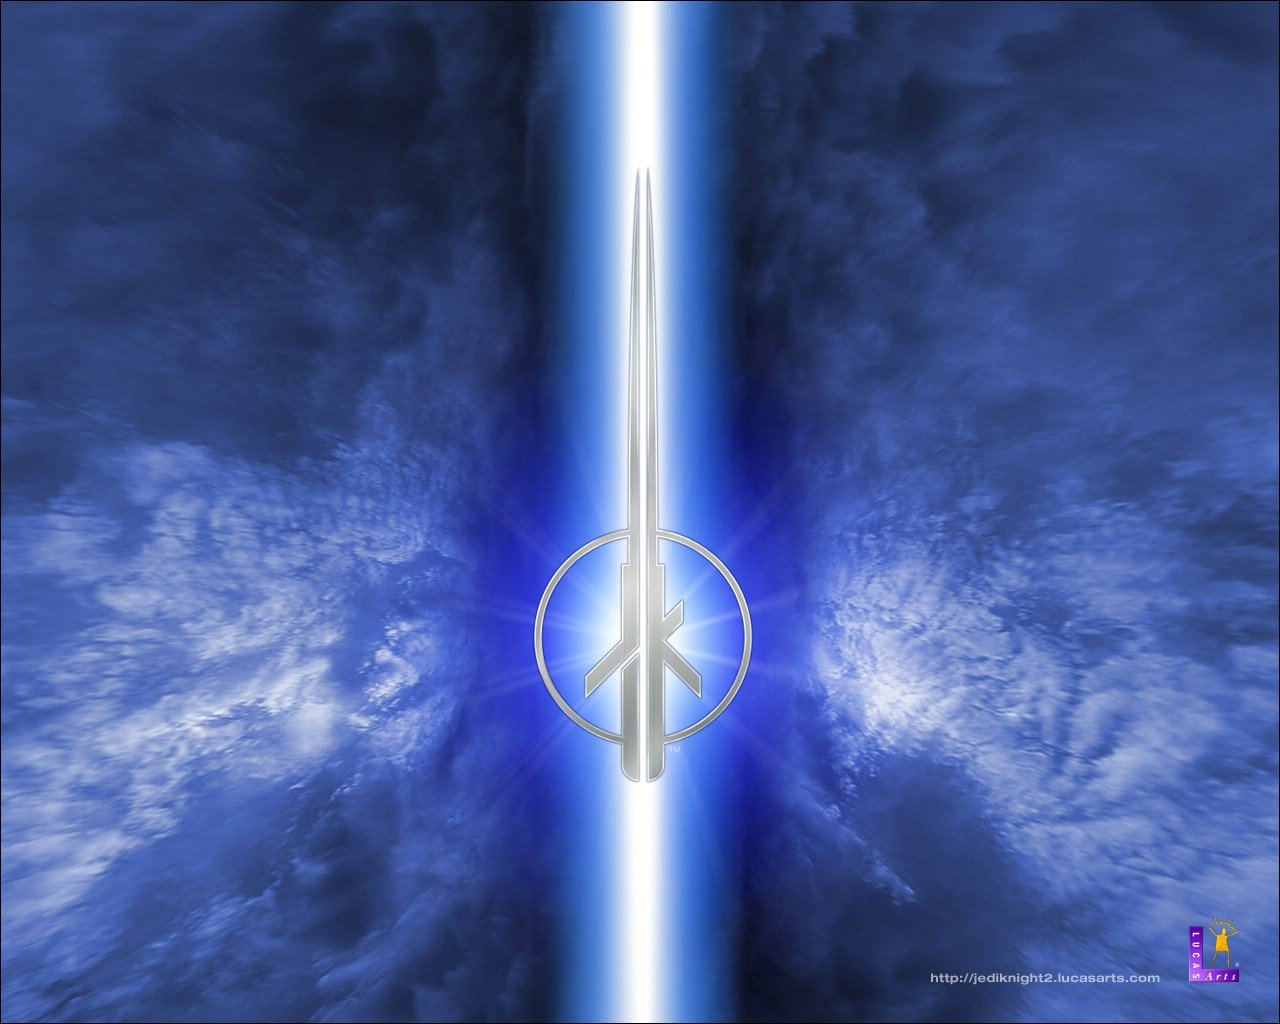 Awesome Lightsaber Free Wallpaper Id Star Wars Jedi Outcast 1280x1024 Wallpaper Teahub Io